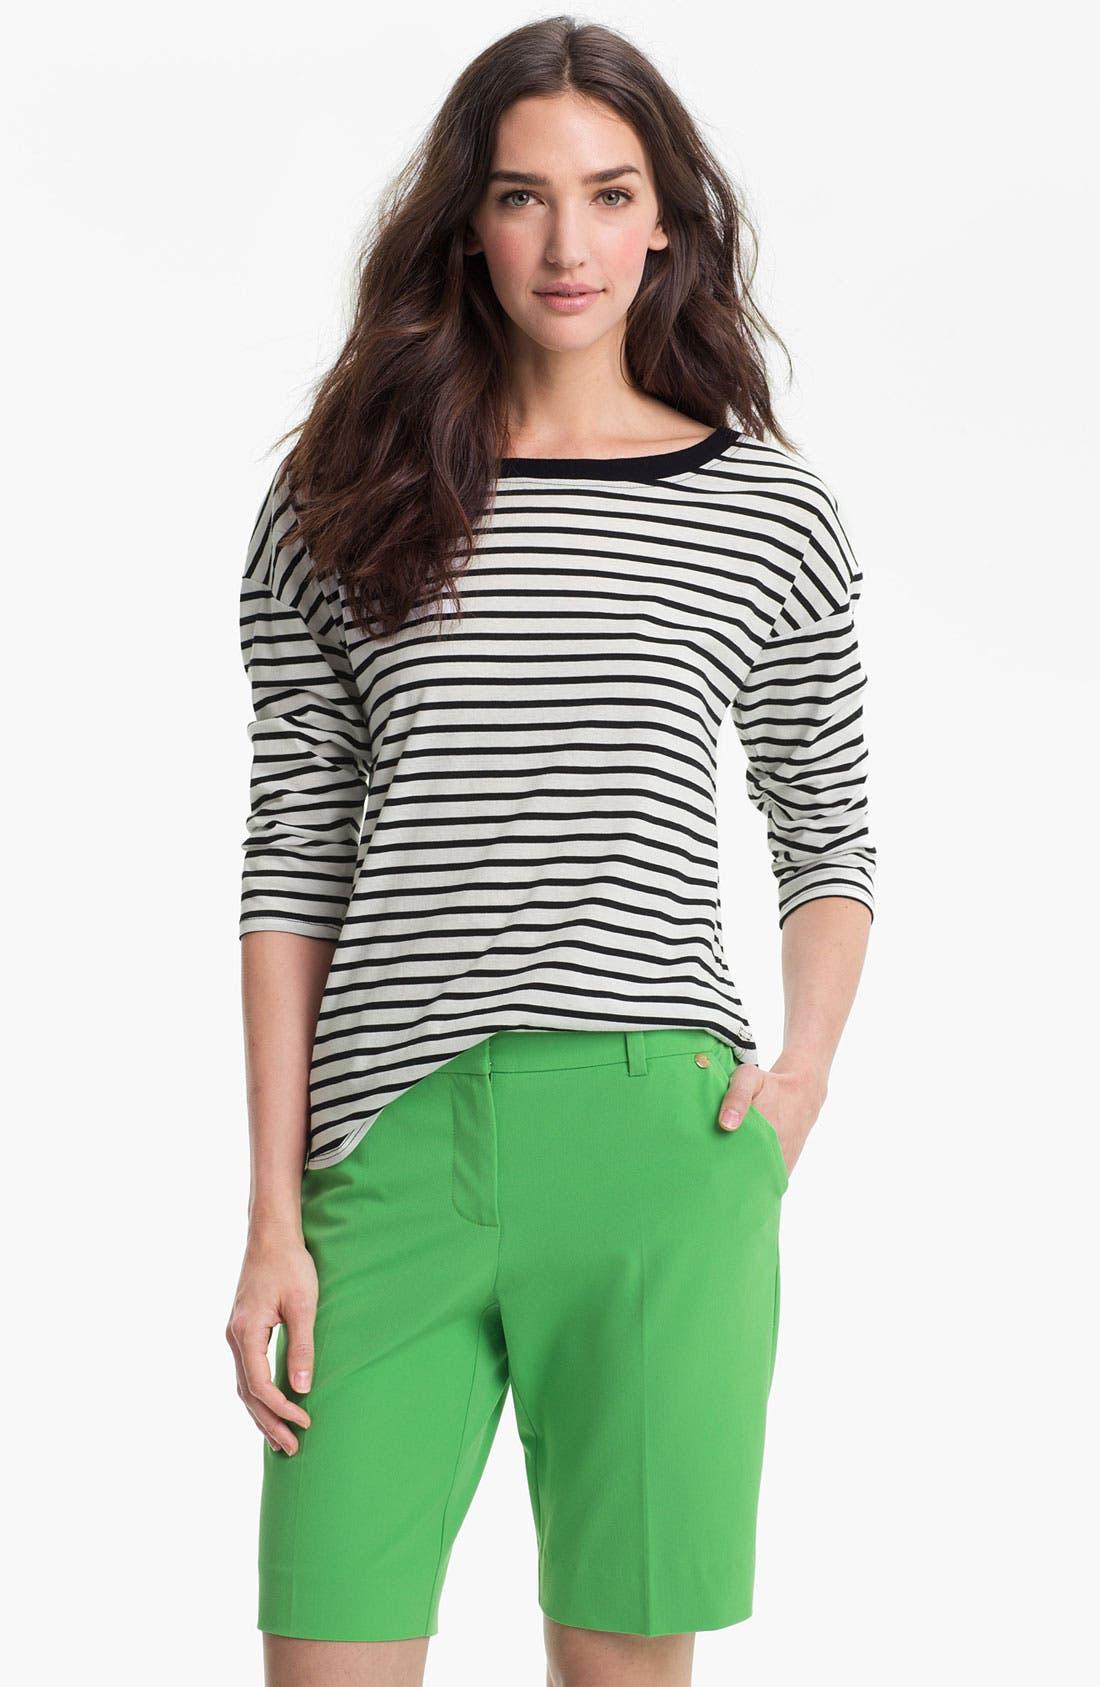 Alternate Image 1 Selected - Trina Turk Stripe Jersey Top